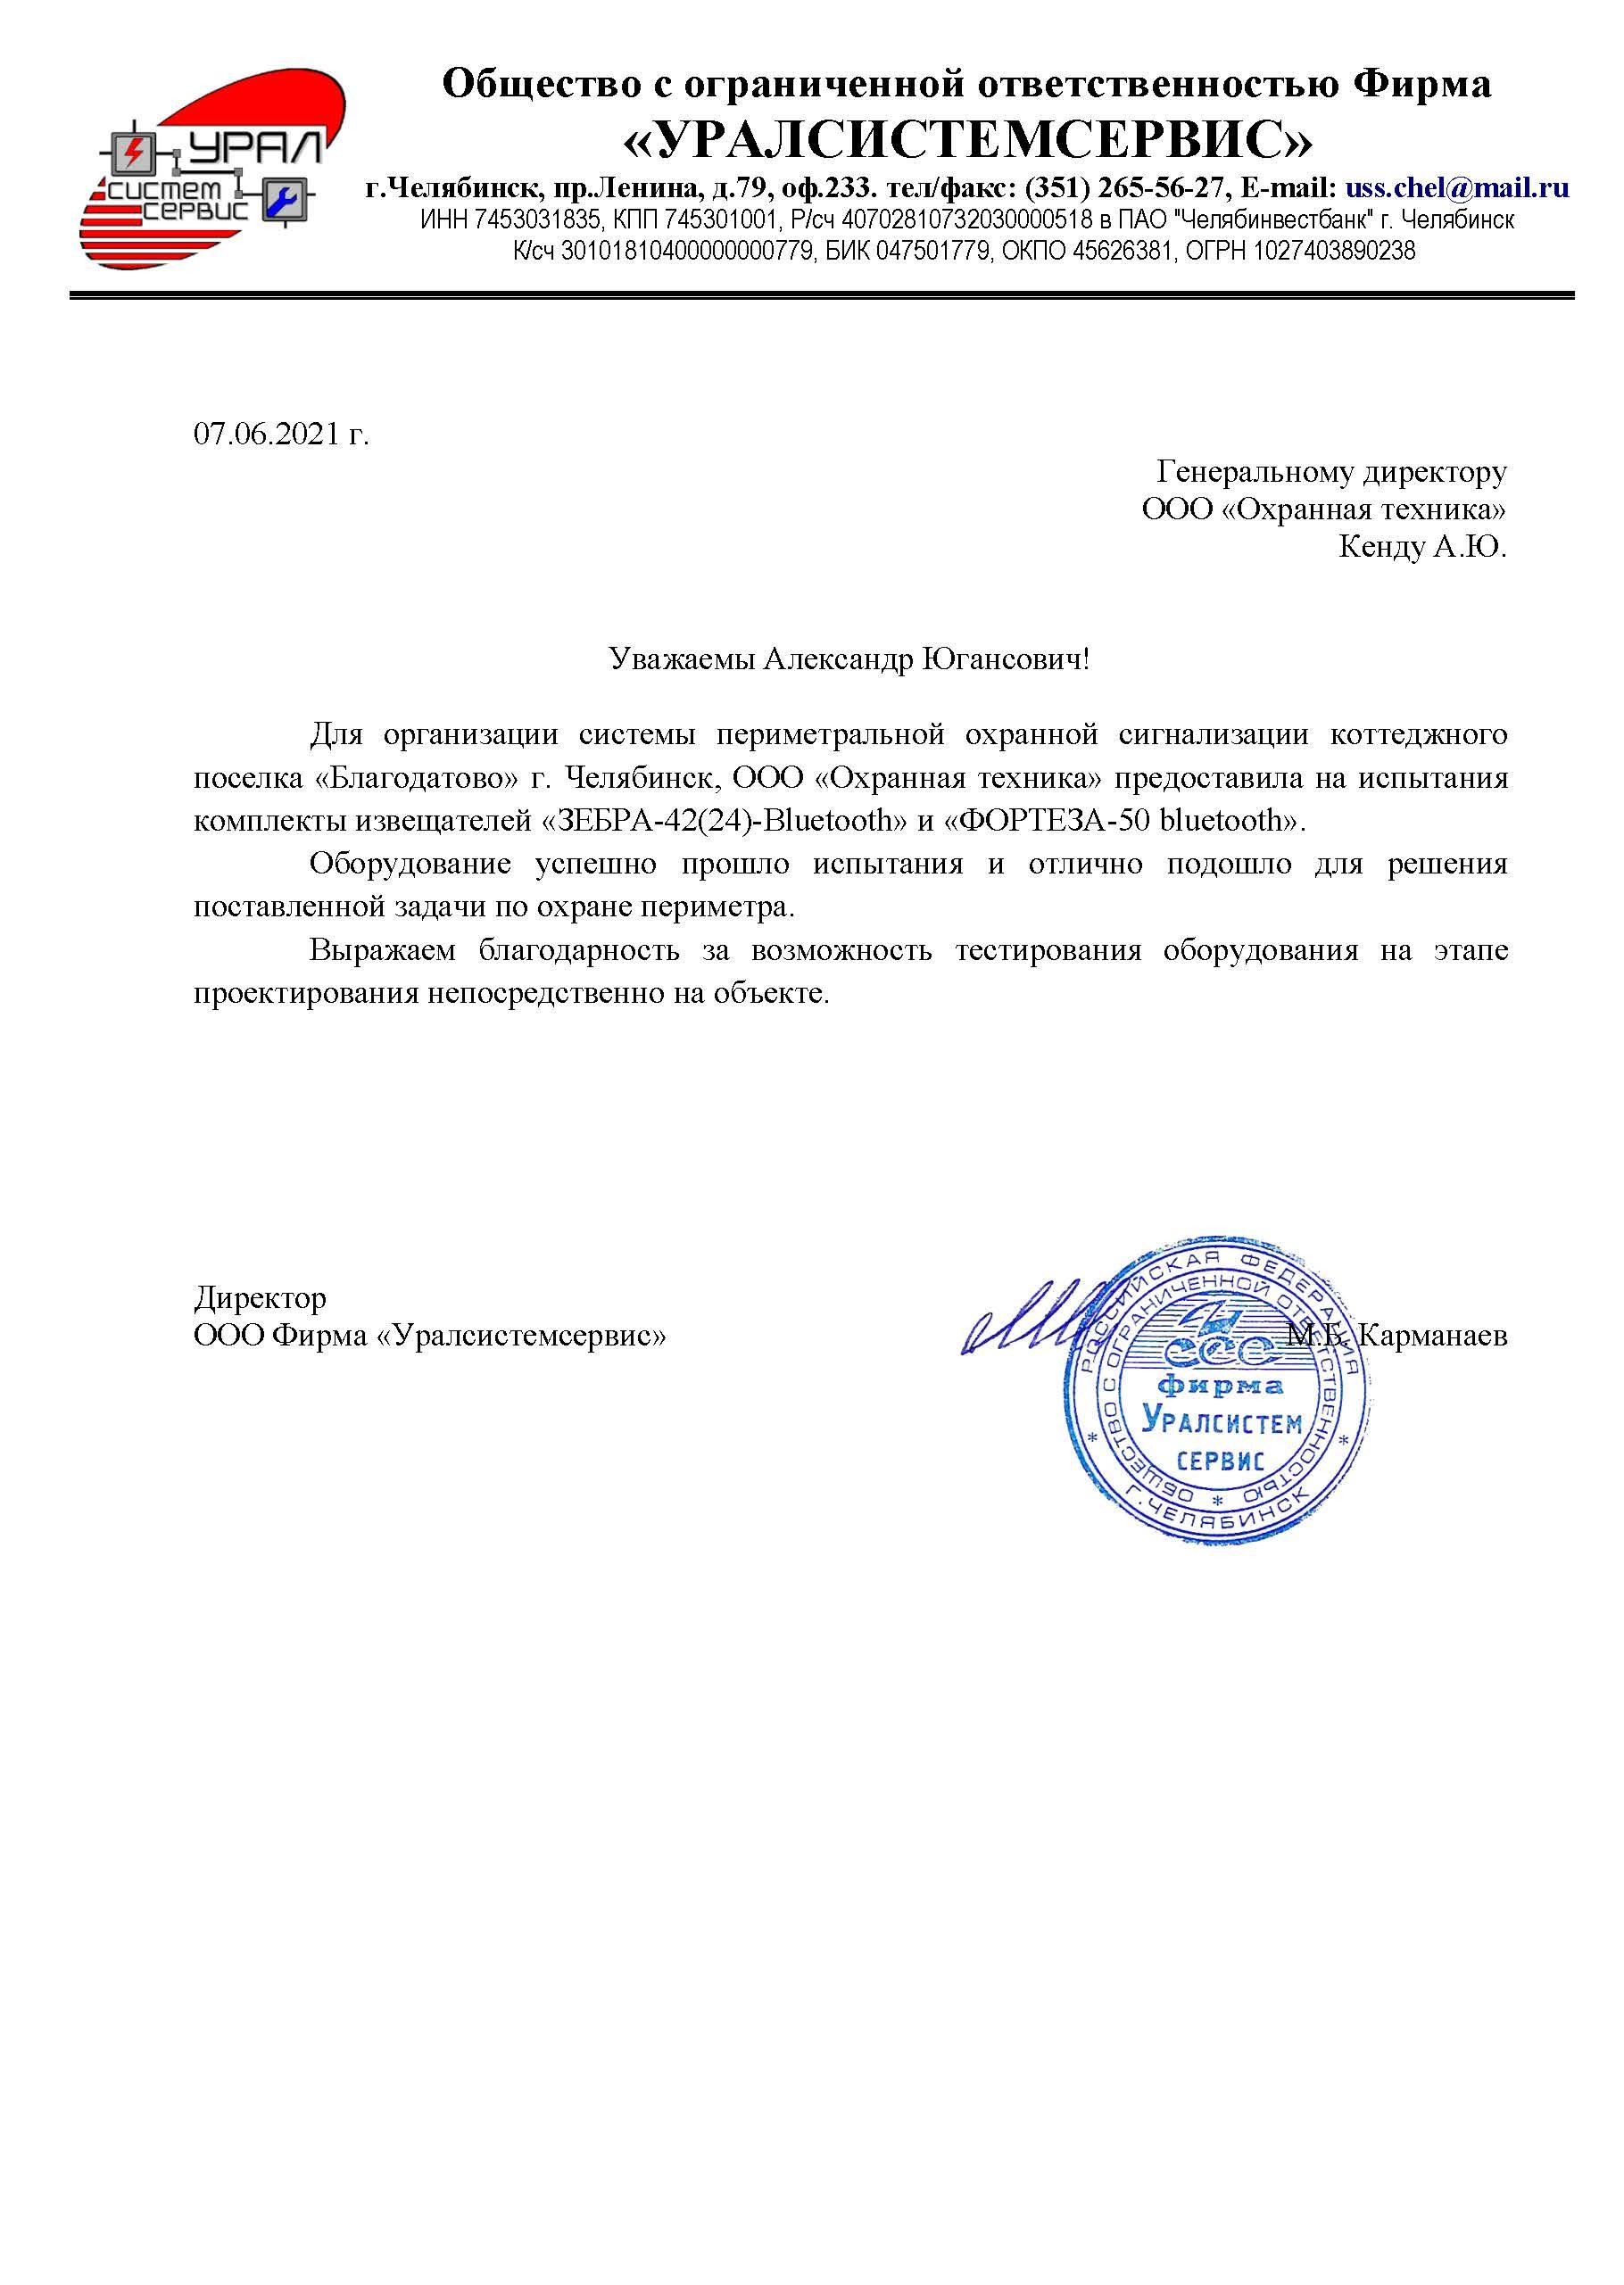 "Отзыв от ООО Фирма ""УРАЛСИСТЕМСЕРВИС"""